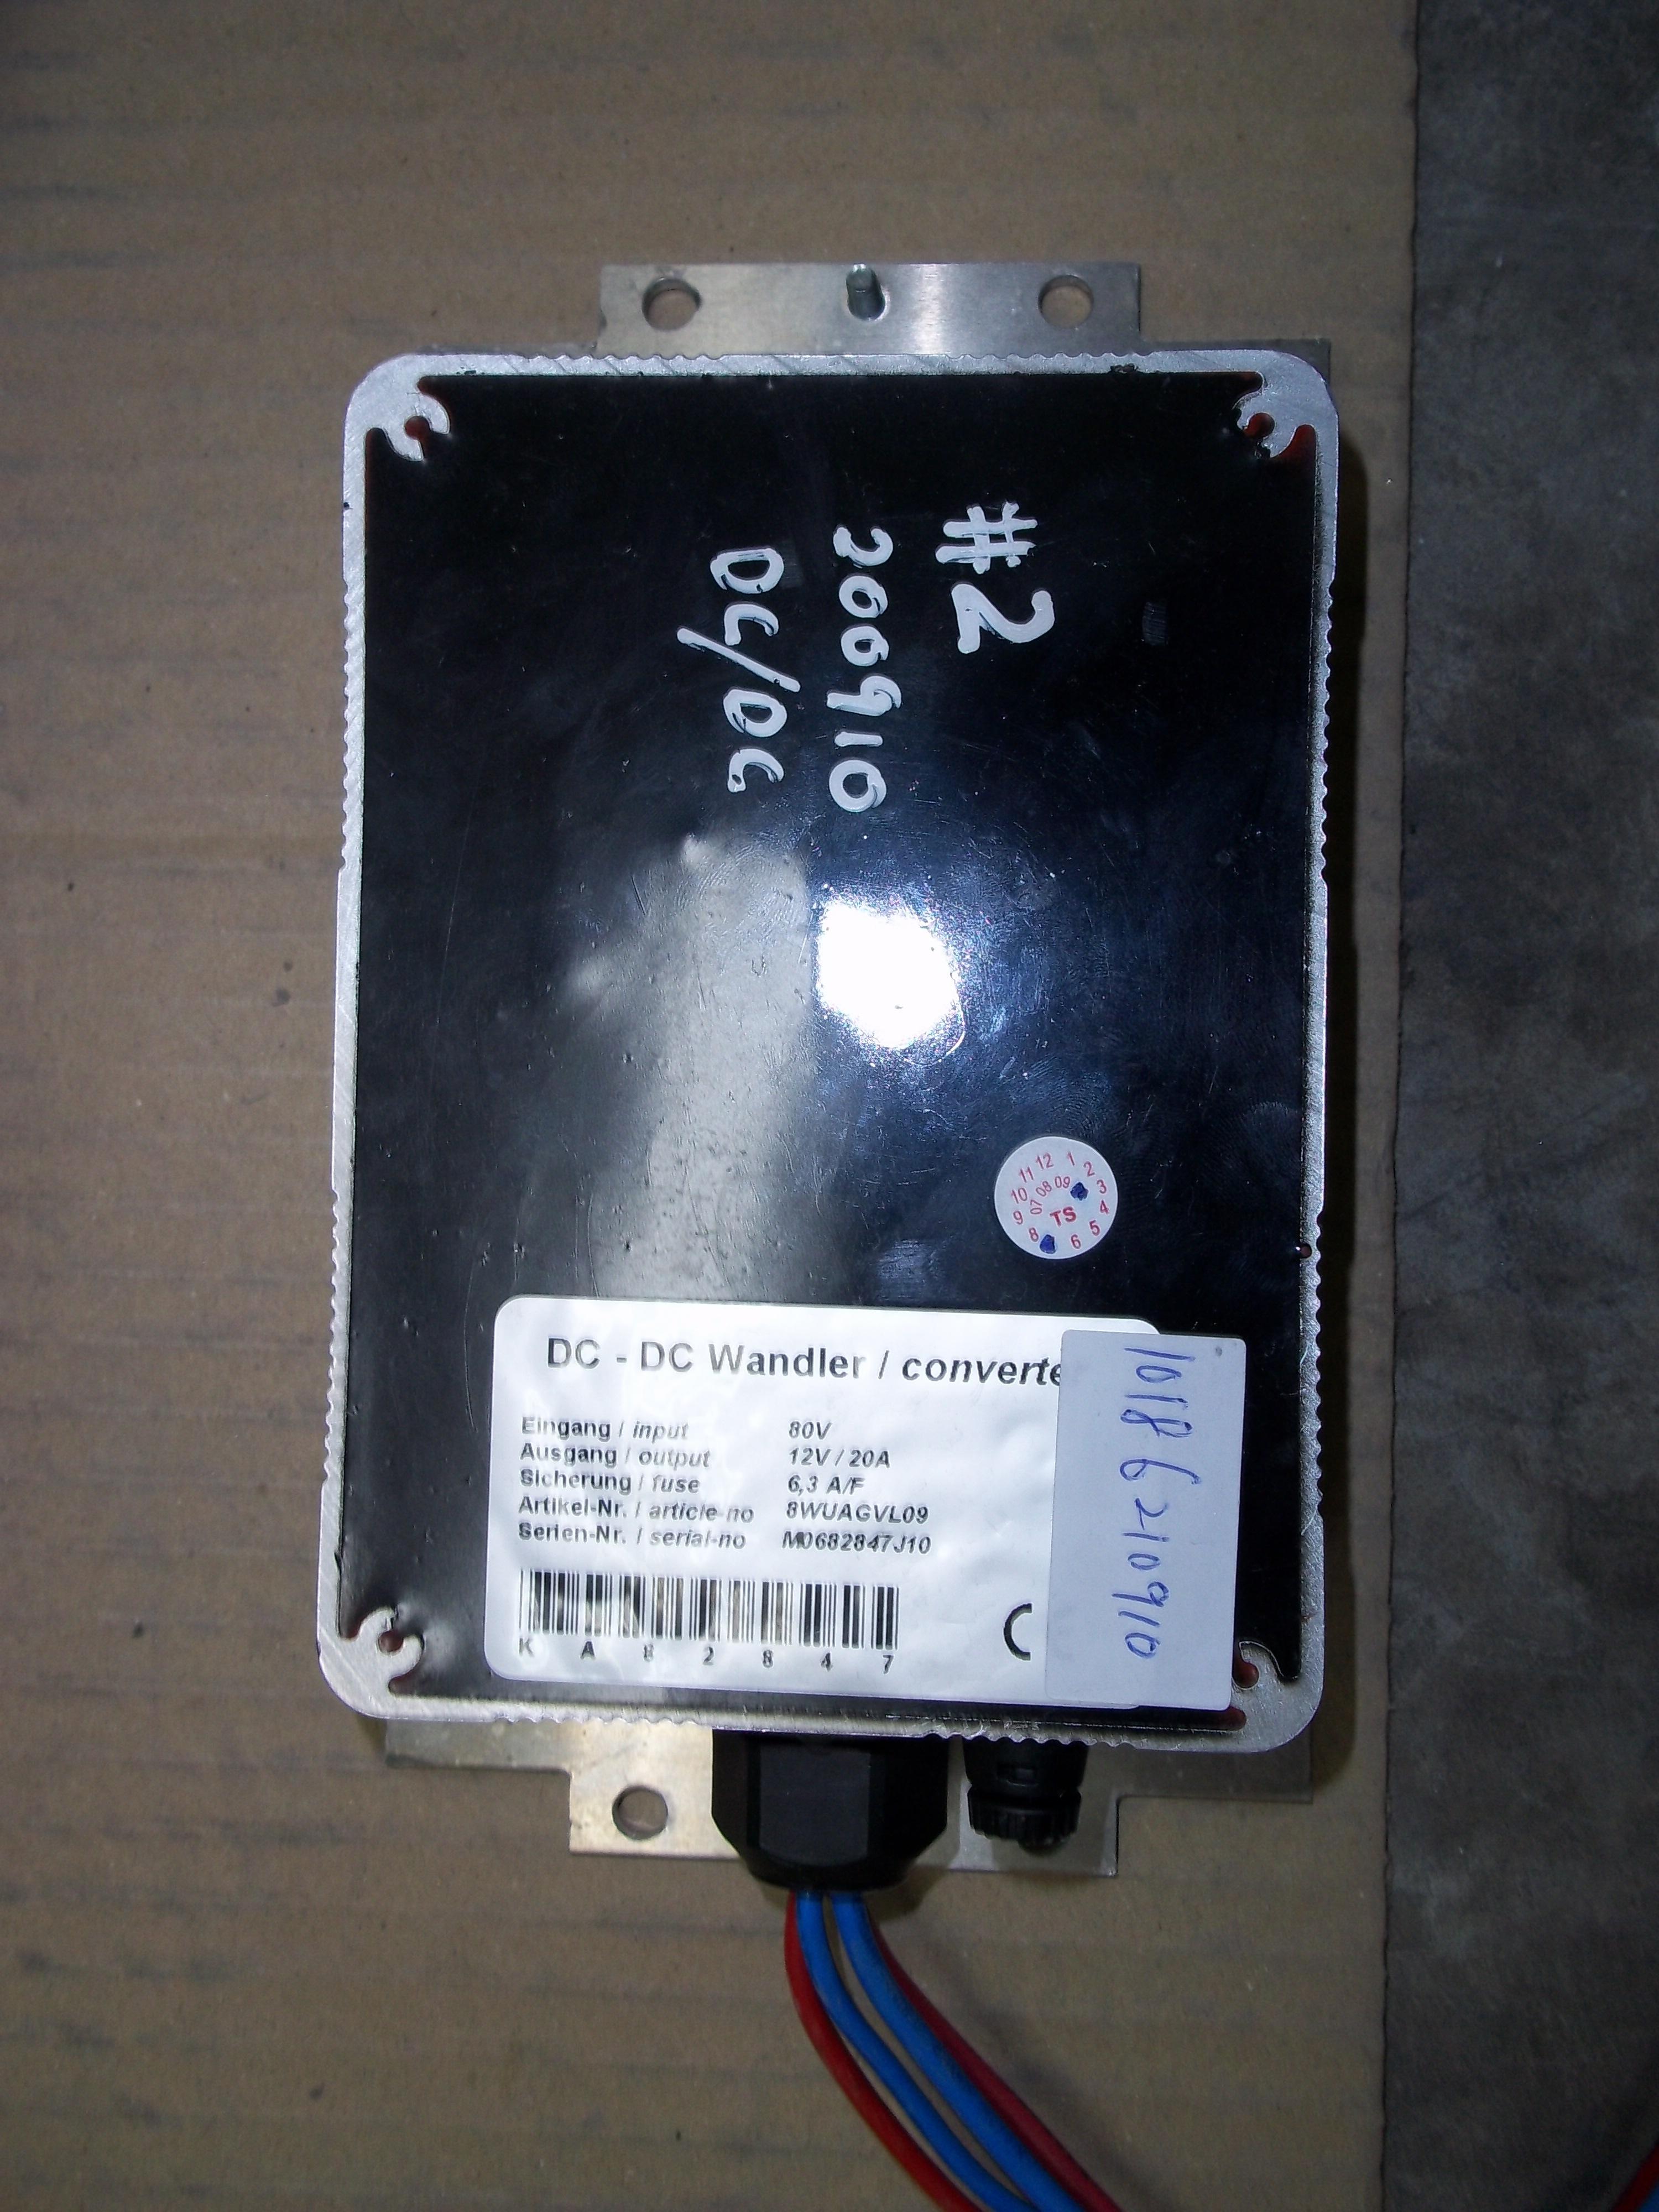 Repair 8WUAGVL09 WANDLER CONVERTER 250W in Malaysia, Singapore, Thailand, Indonesia